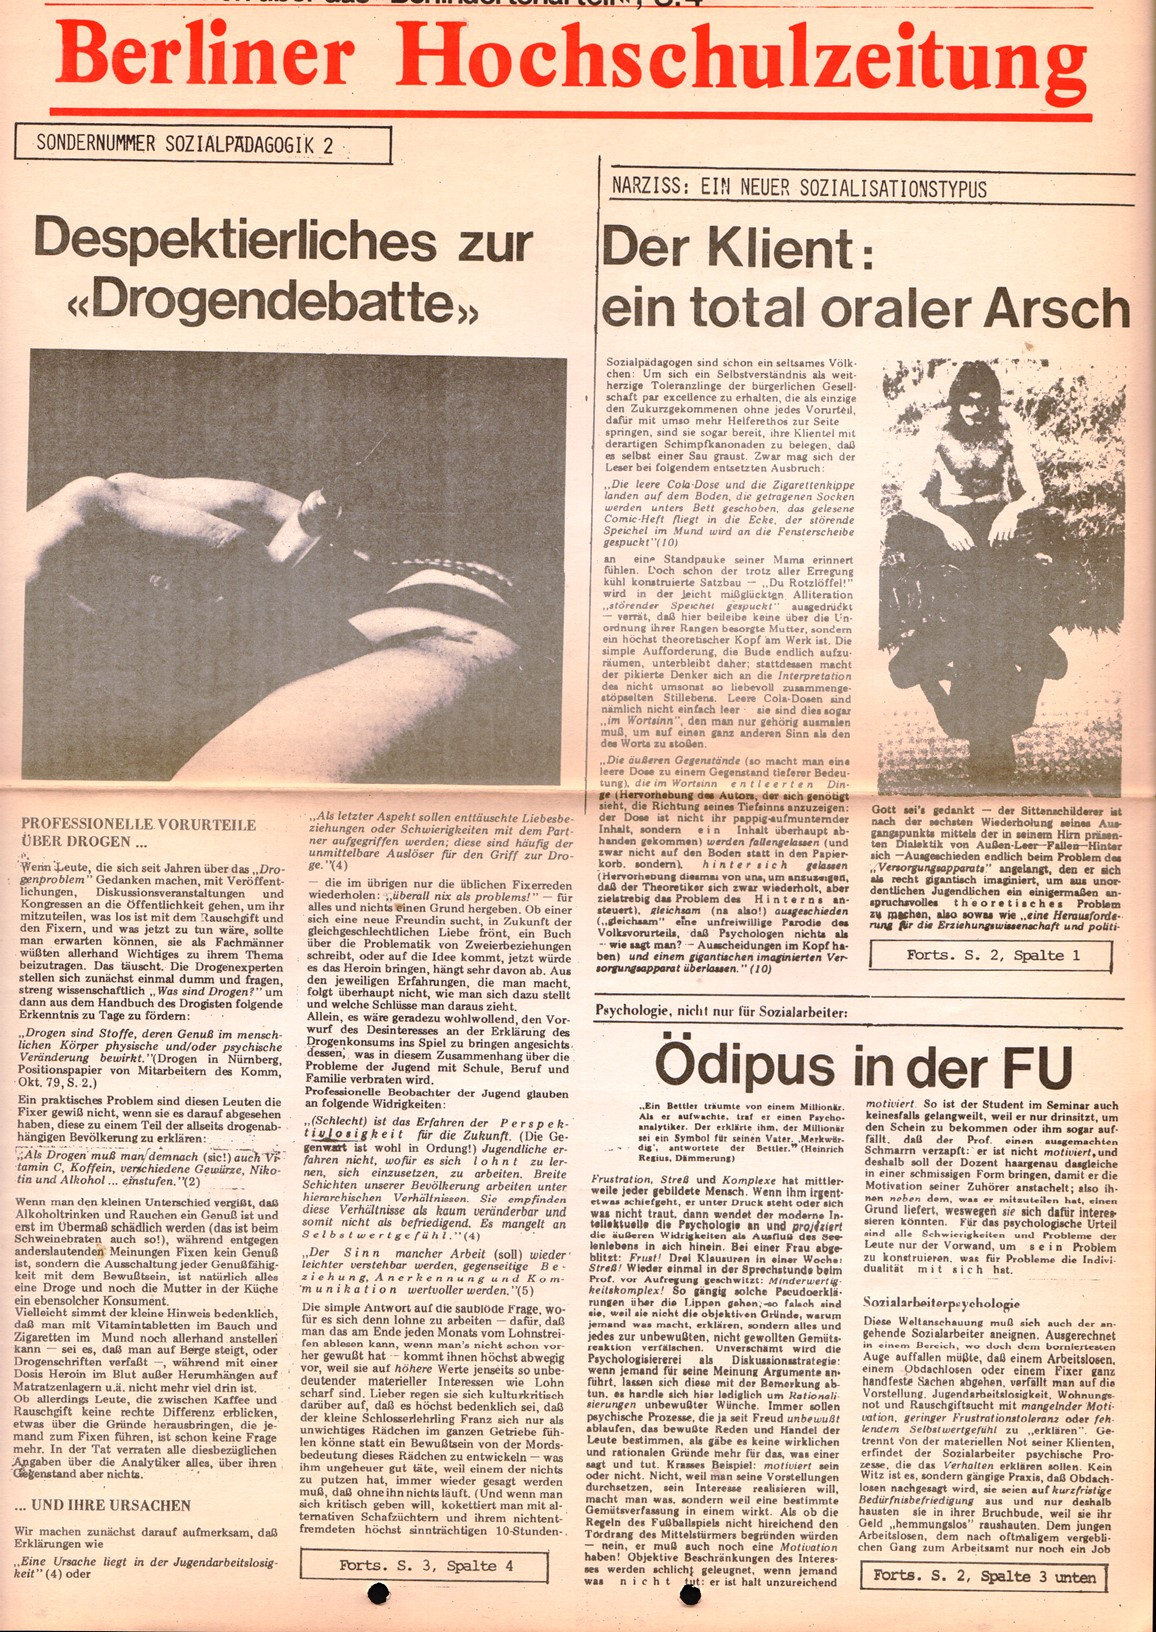 Berlin_MG_Hochschulzeitung_19791200_Sozpaed2_01